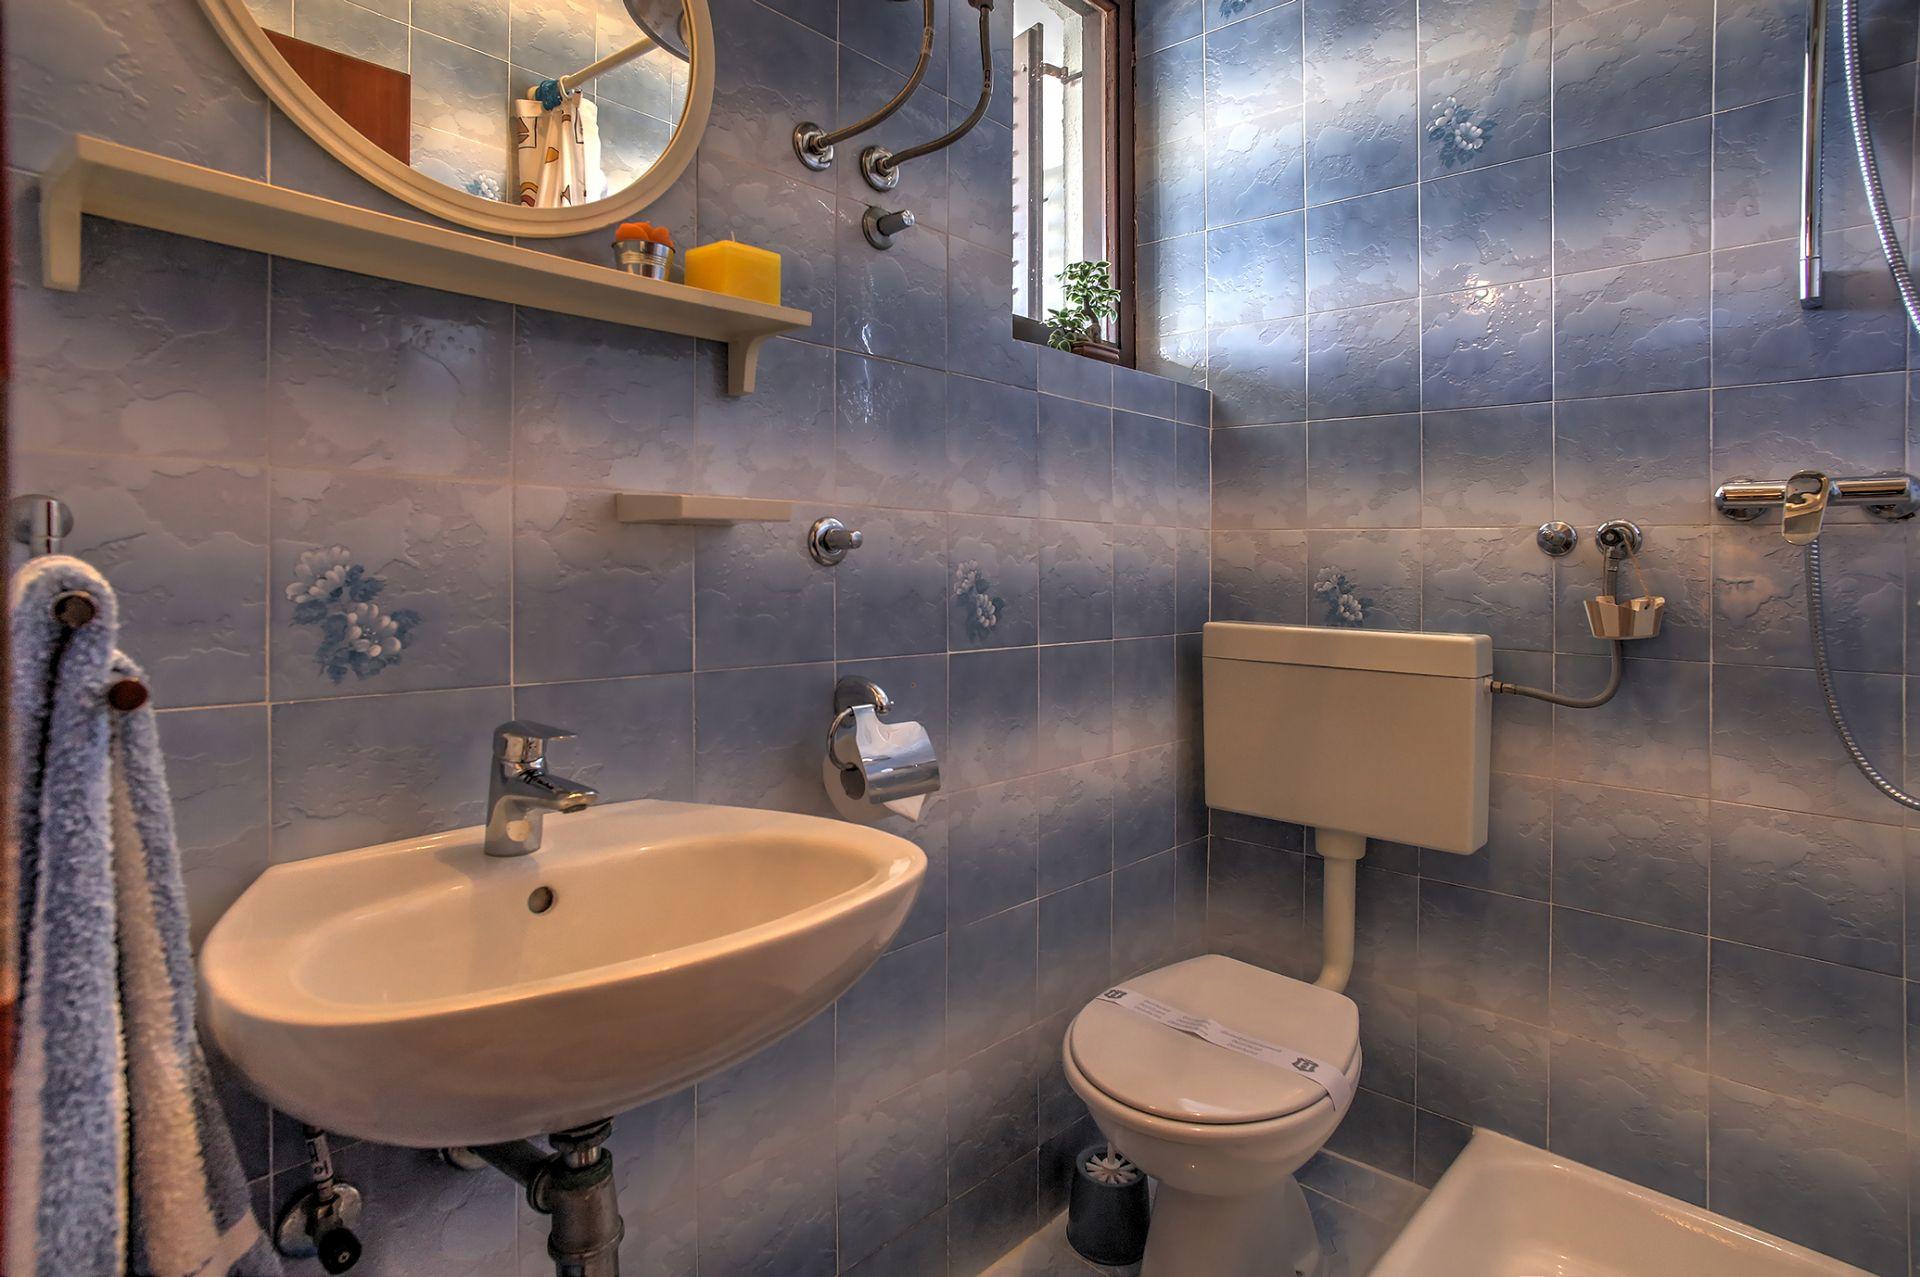 5409 - Jezera - Apartments Croatia - SA3(2): bathroom with toilet